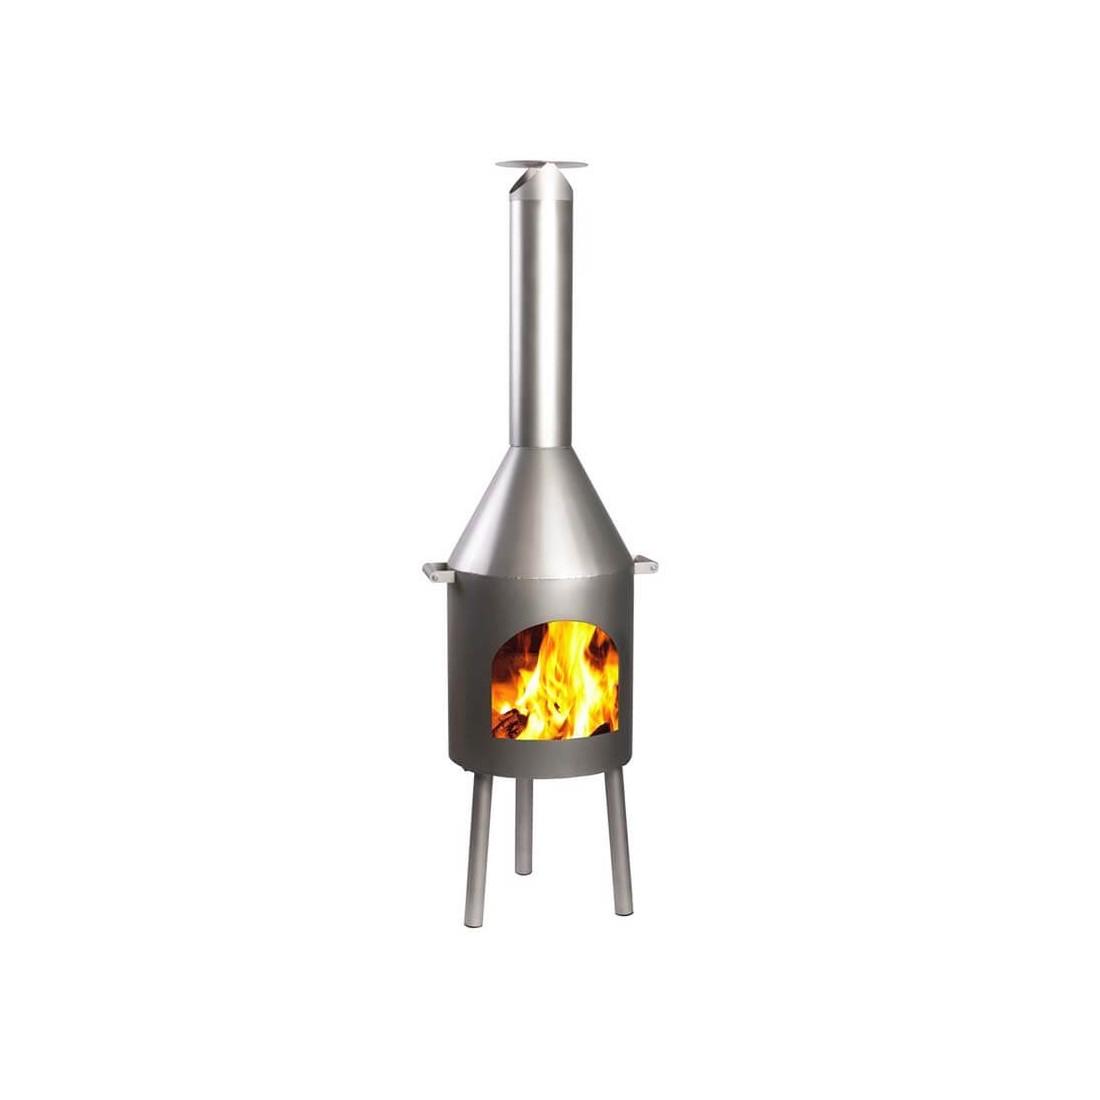 On Sale Extra Large Inox Stainless Steel Chiminea Heater